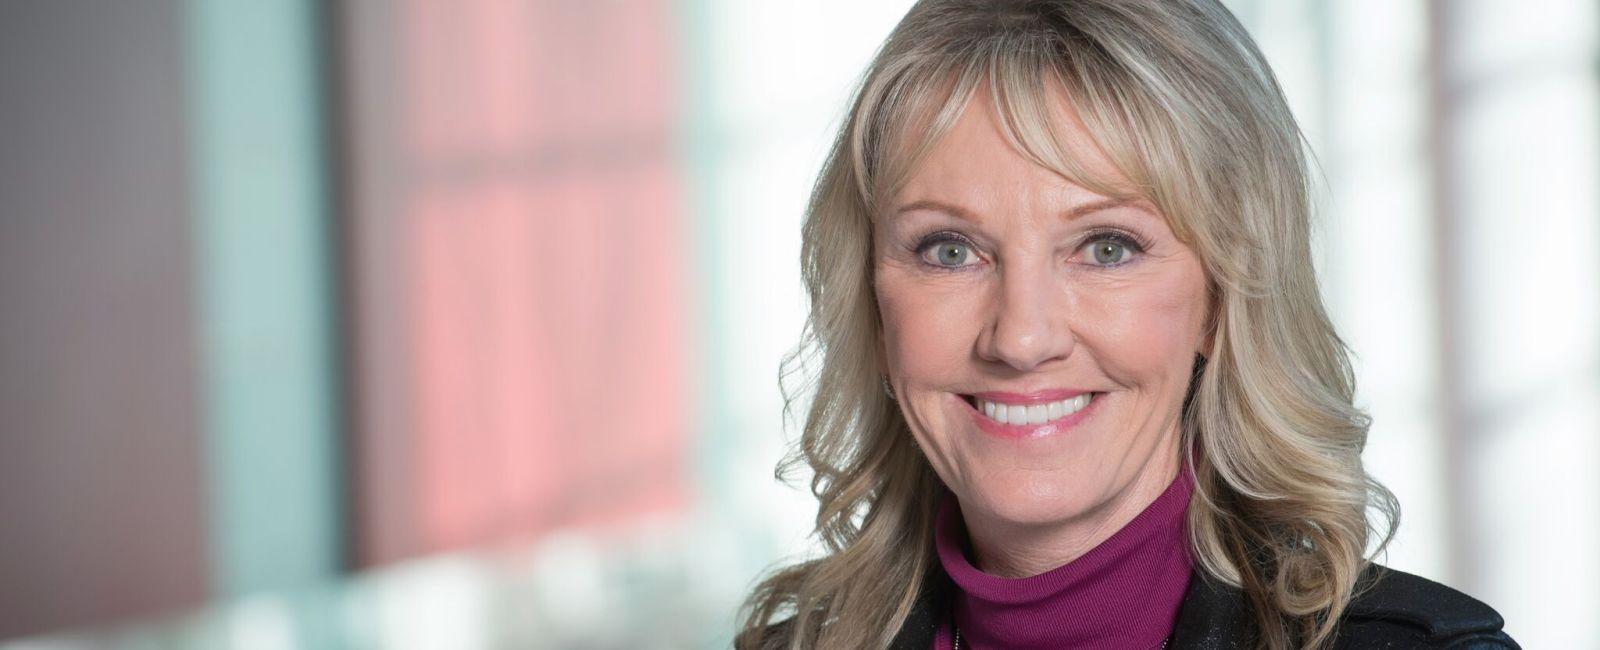 Sharon Rowlands, CEO at Web.com